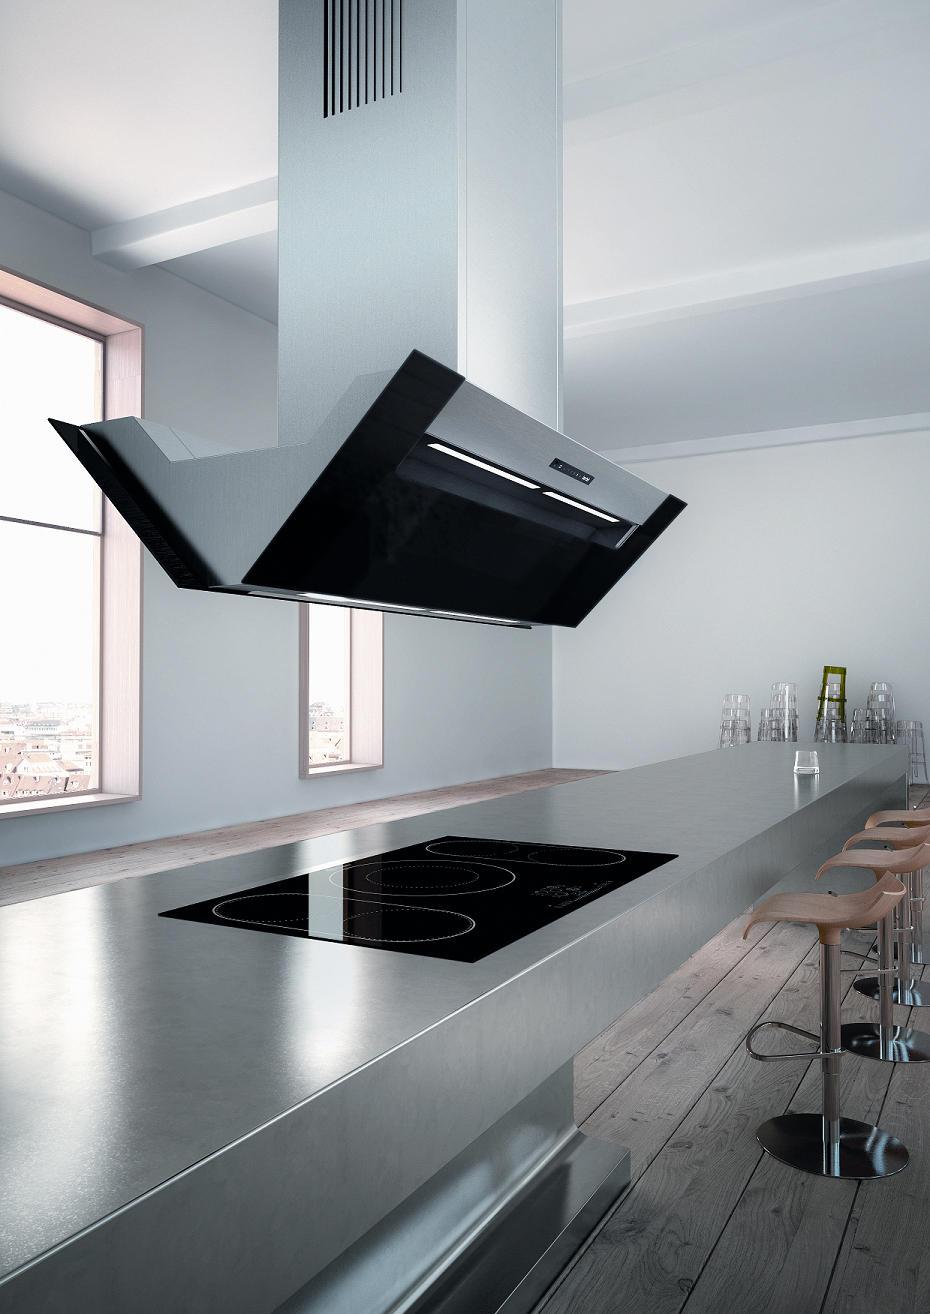 INSELHAUBE ERGOLINE - Küchenabzugshauben von Berbel | Architonic